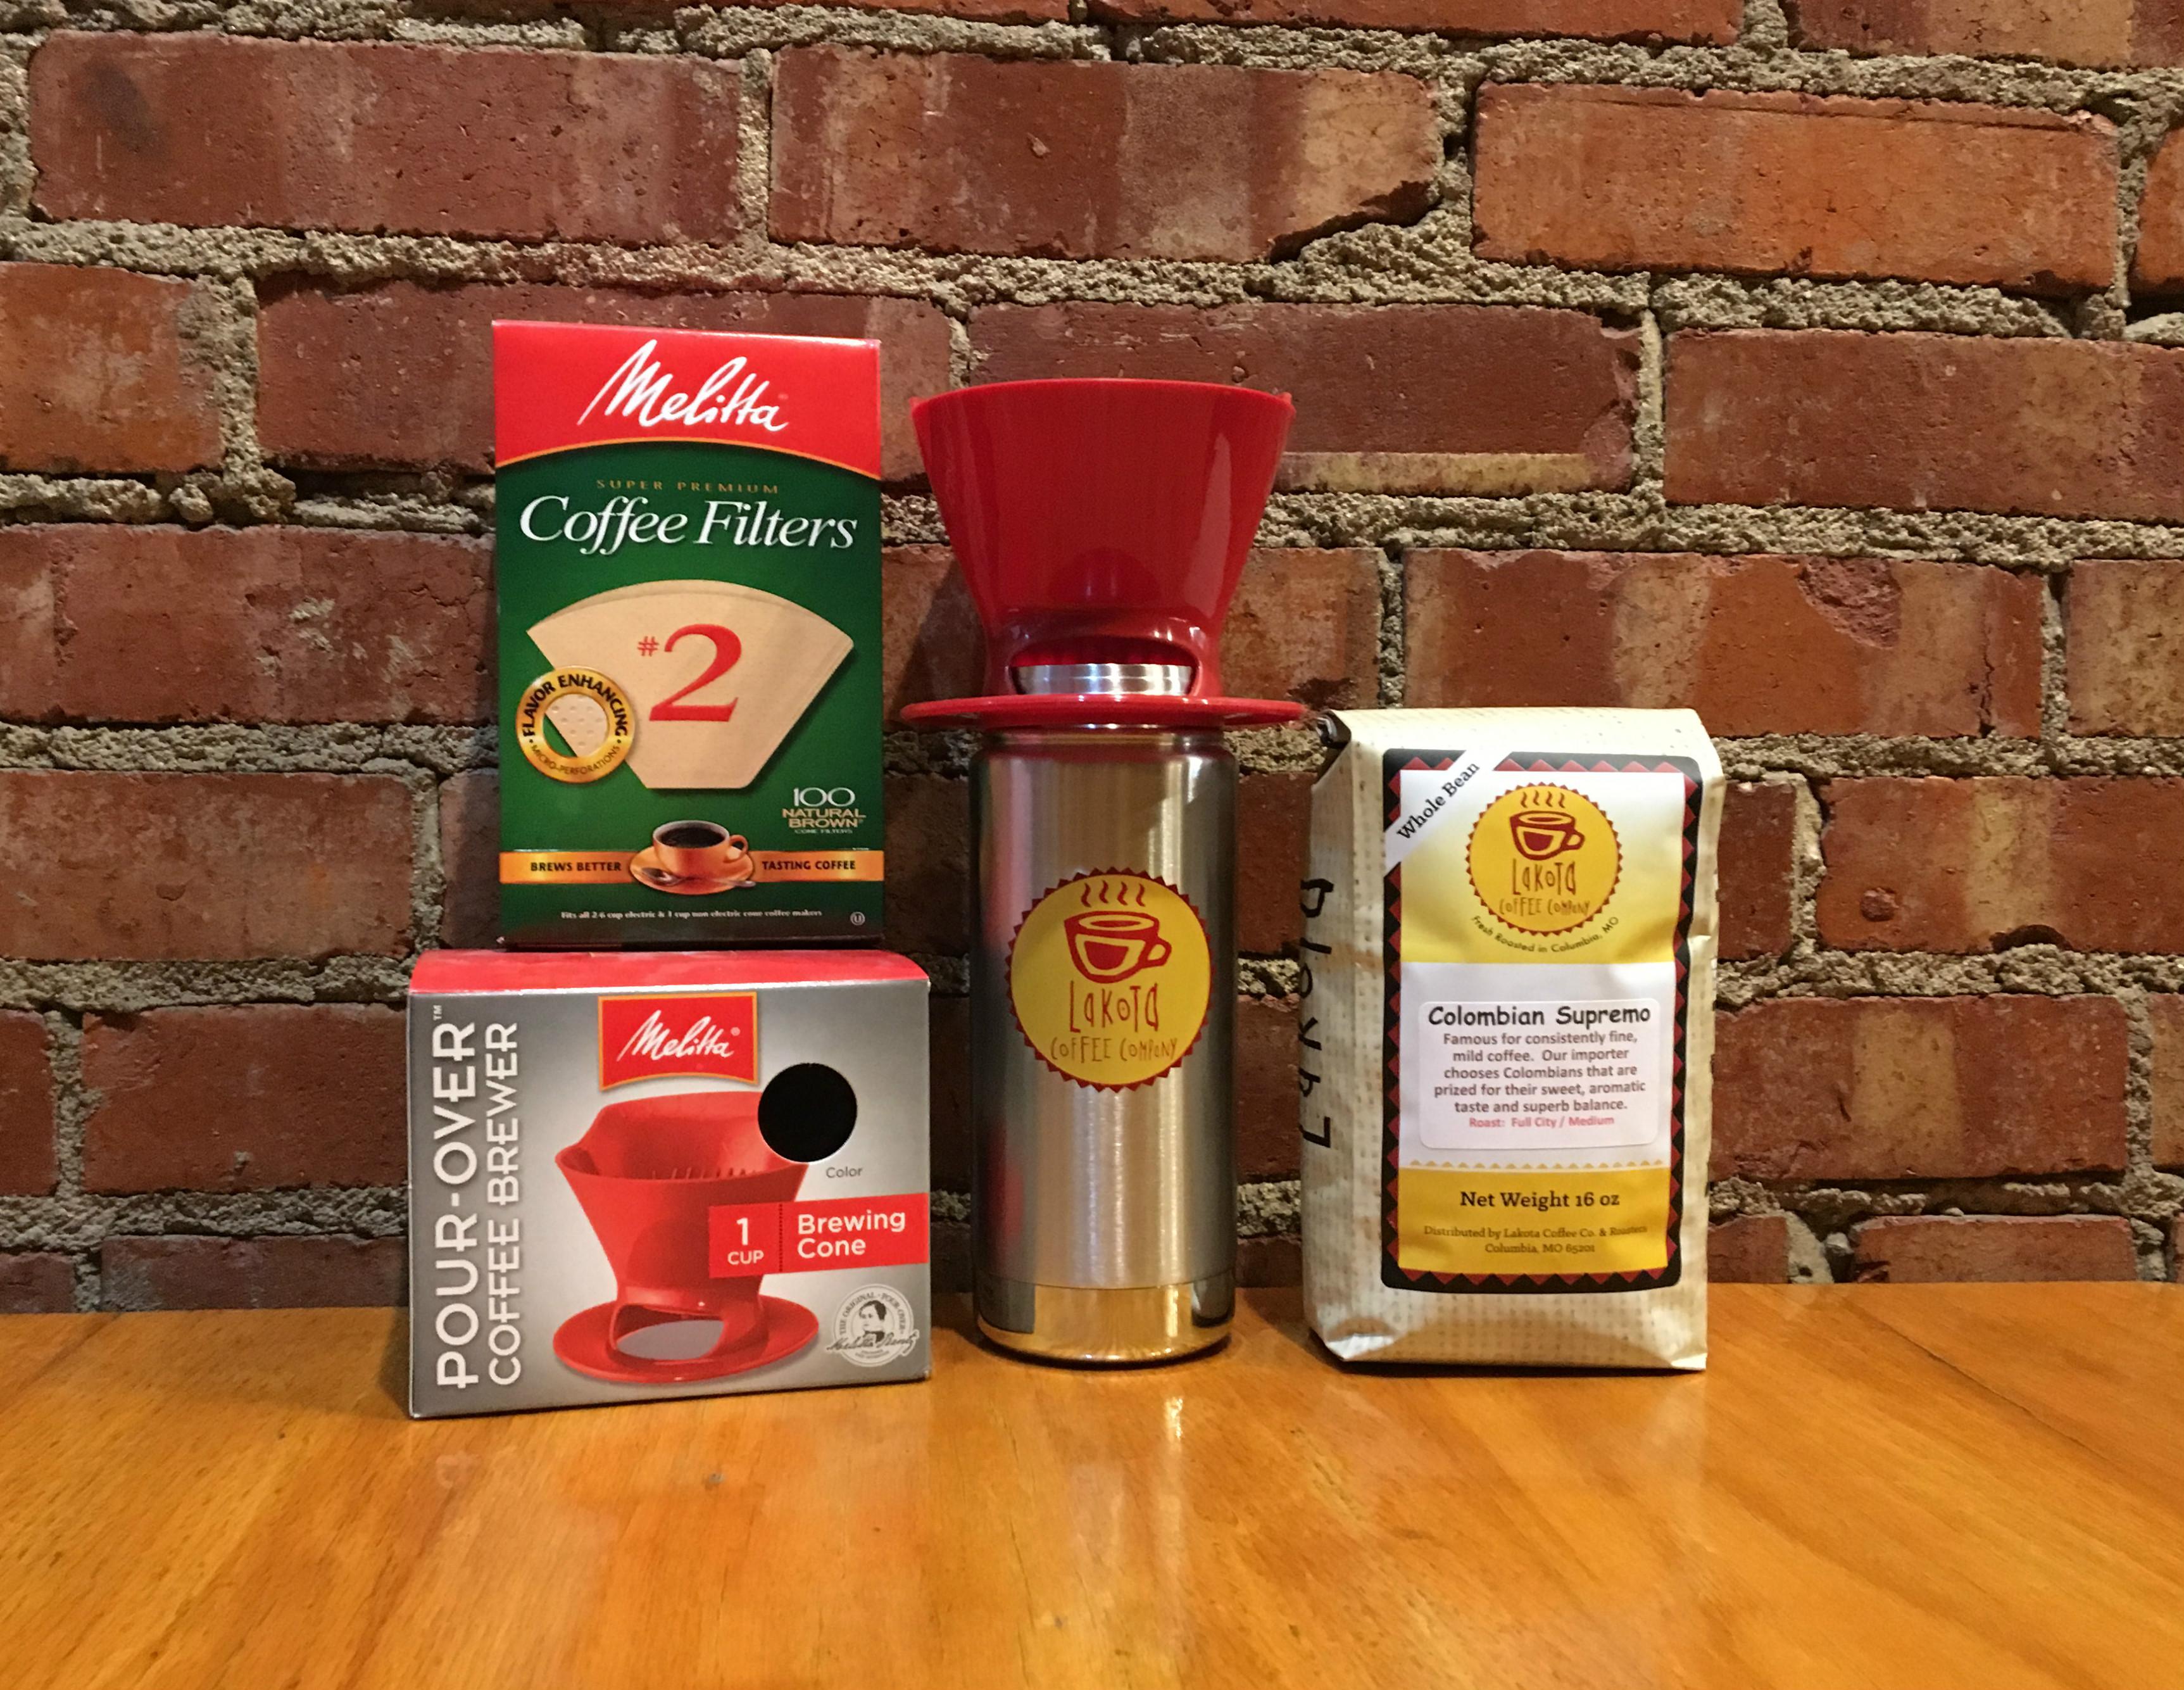 Lakota Coffee Company Klean Canteen, coffee bag, coffee filters and, coffee brewer setting on table